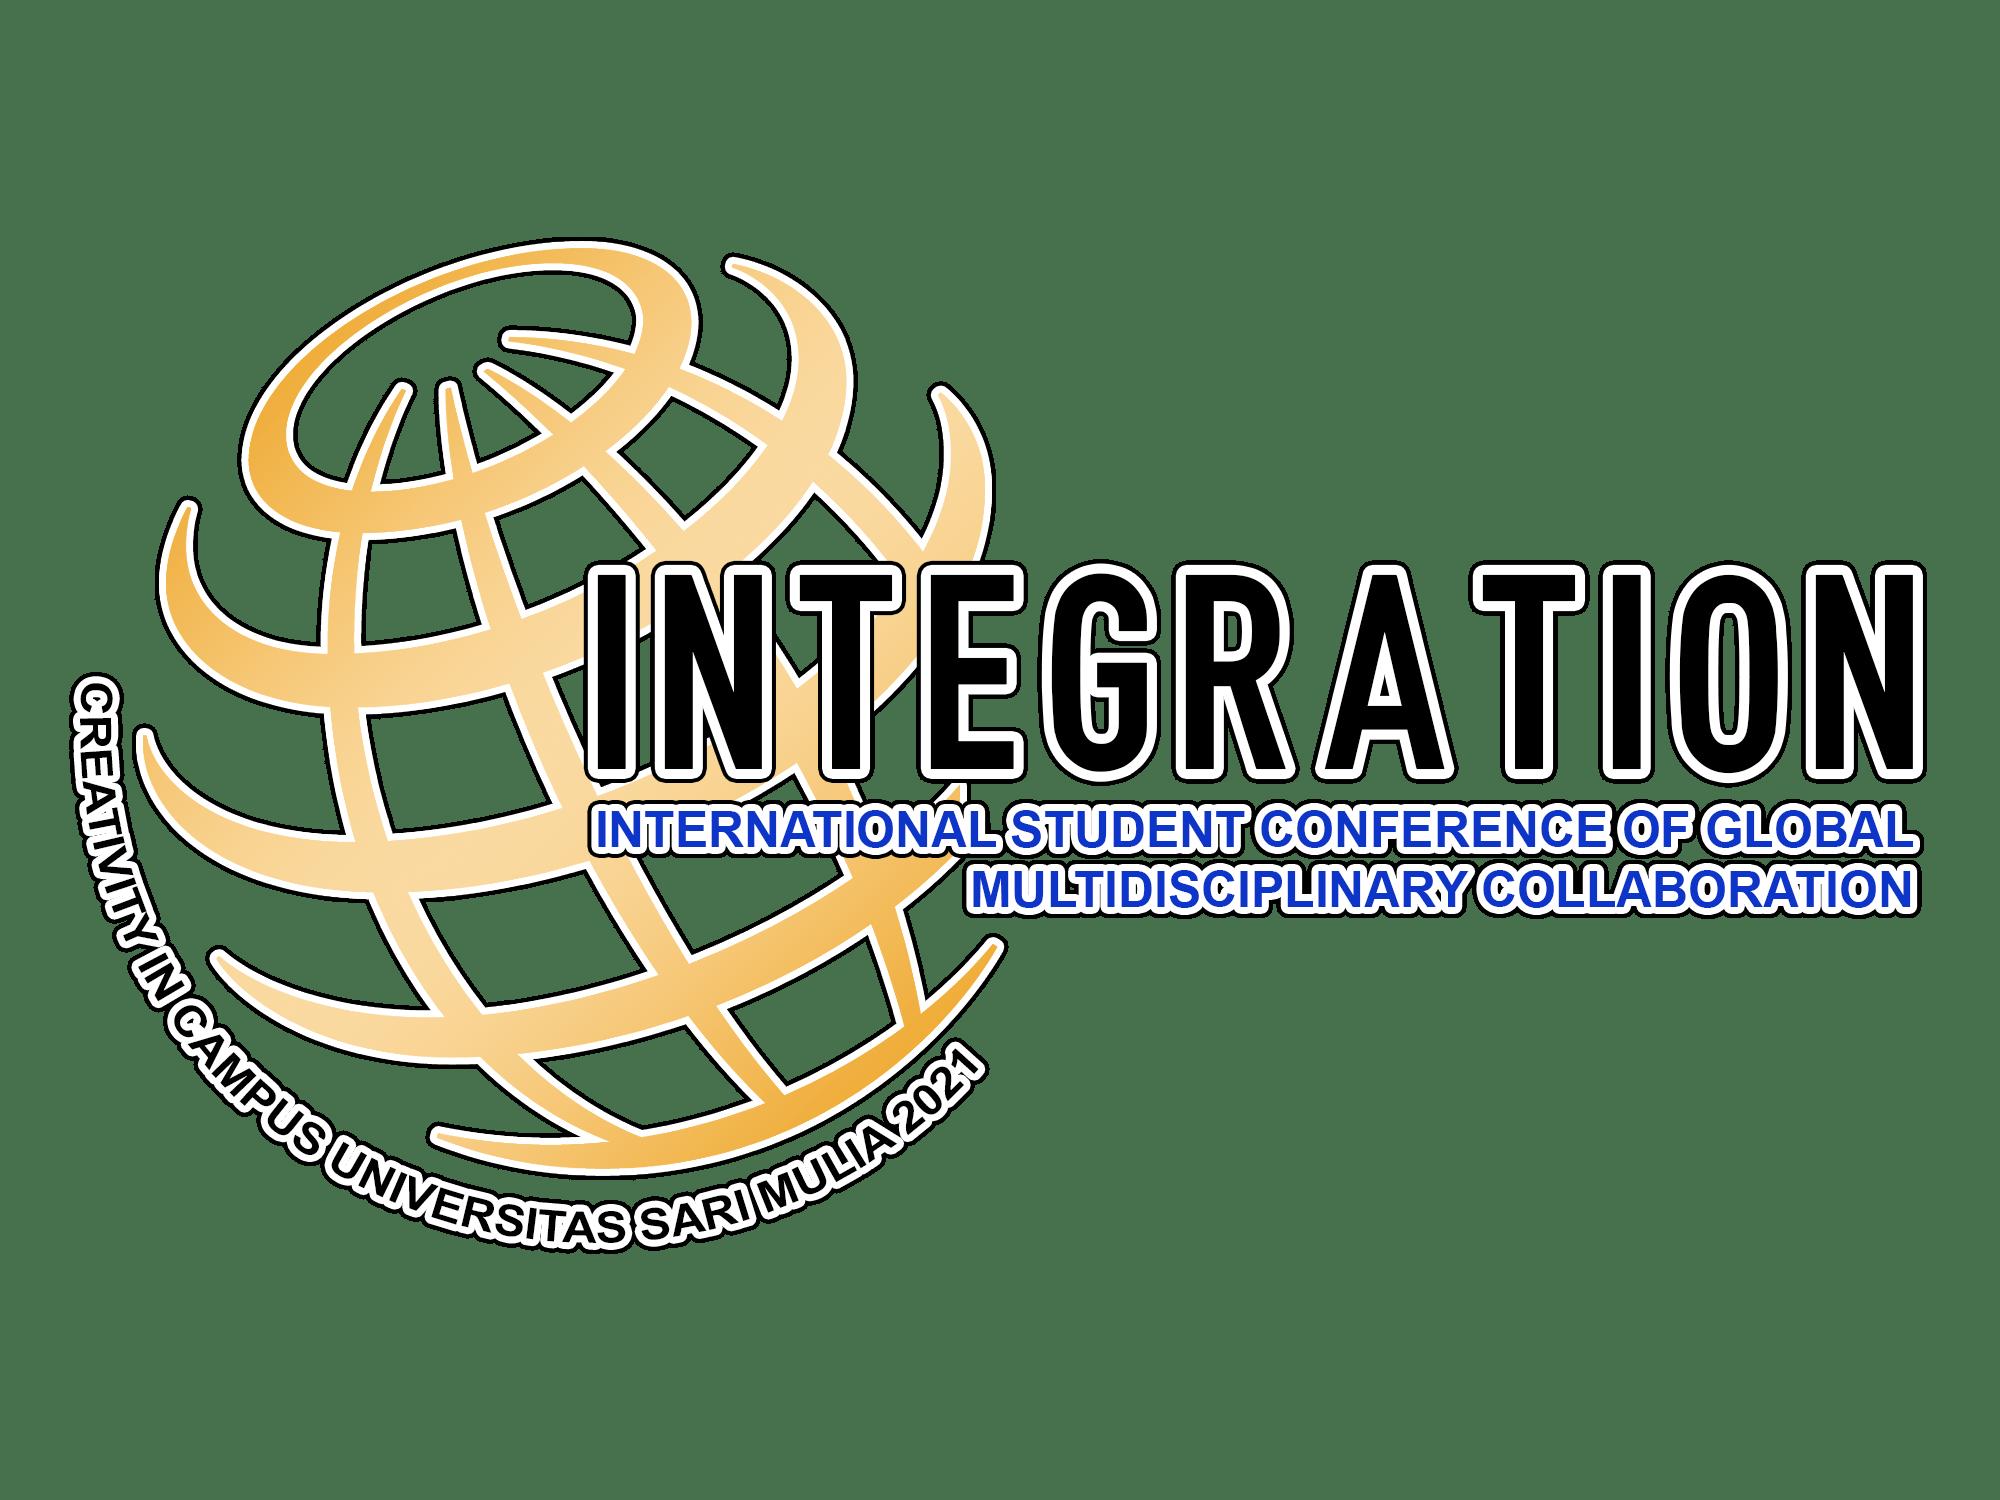 INTEGRATION (International Student Conference and Oral Presentation)